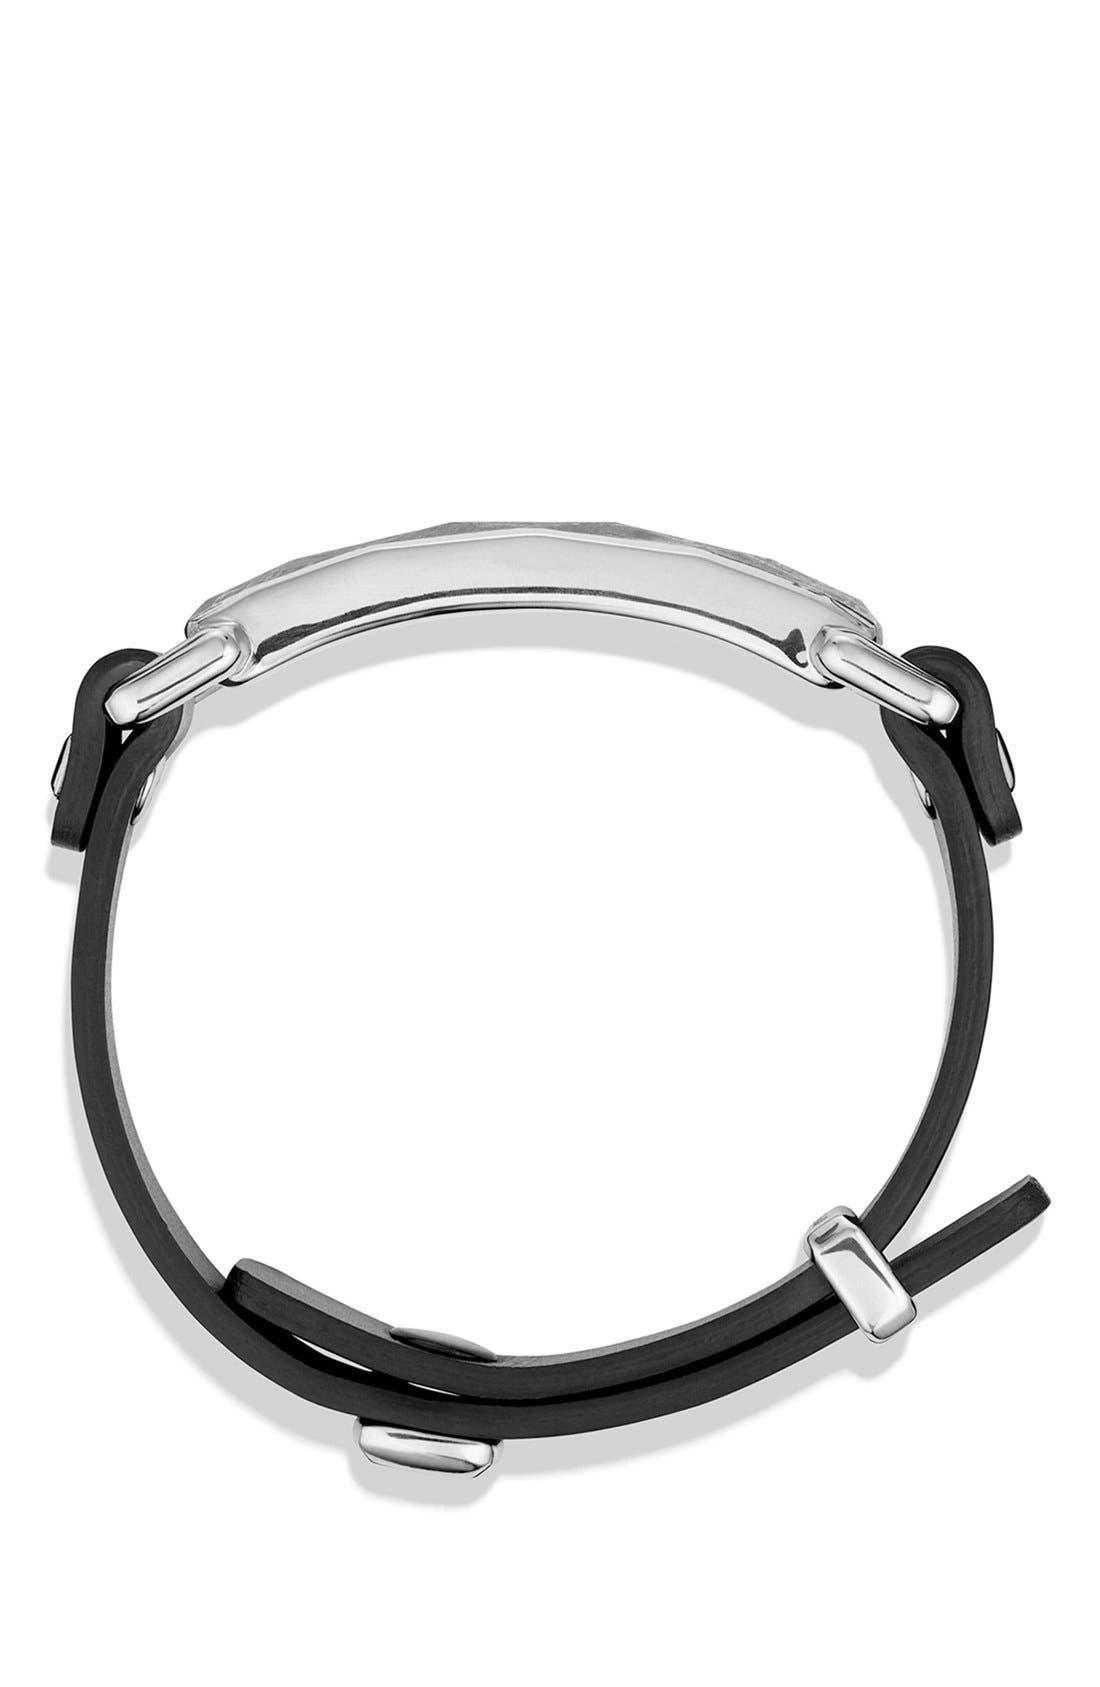 'Meteorite' Leather ID Bracelet in Black,                             Alternate thumbnail 2, color,